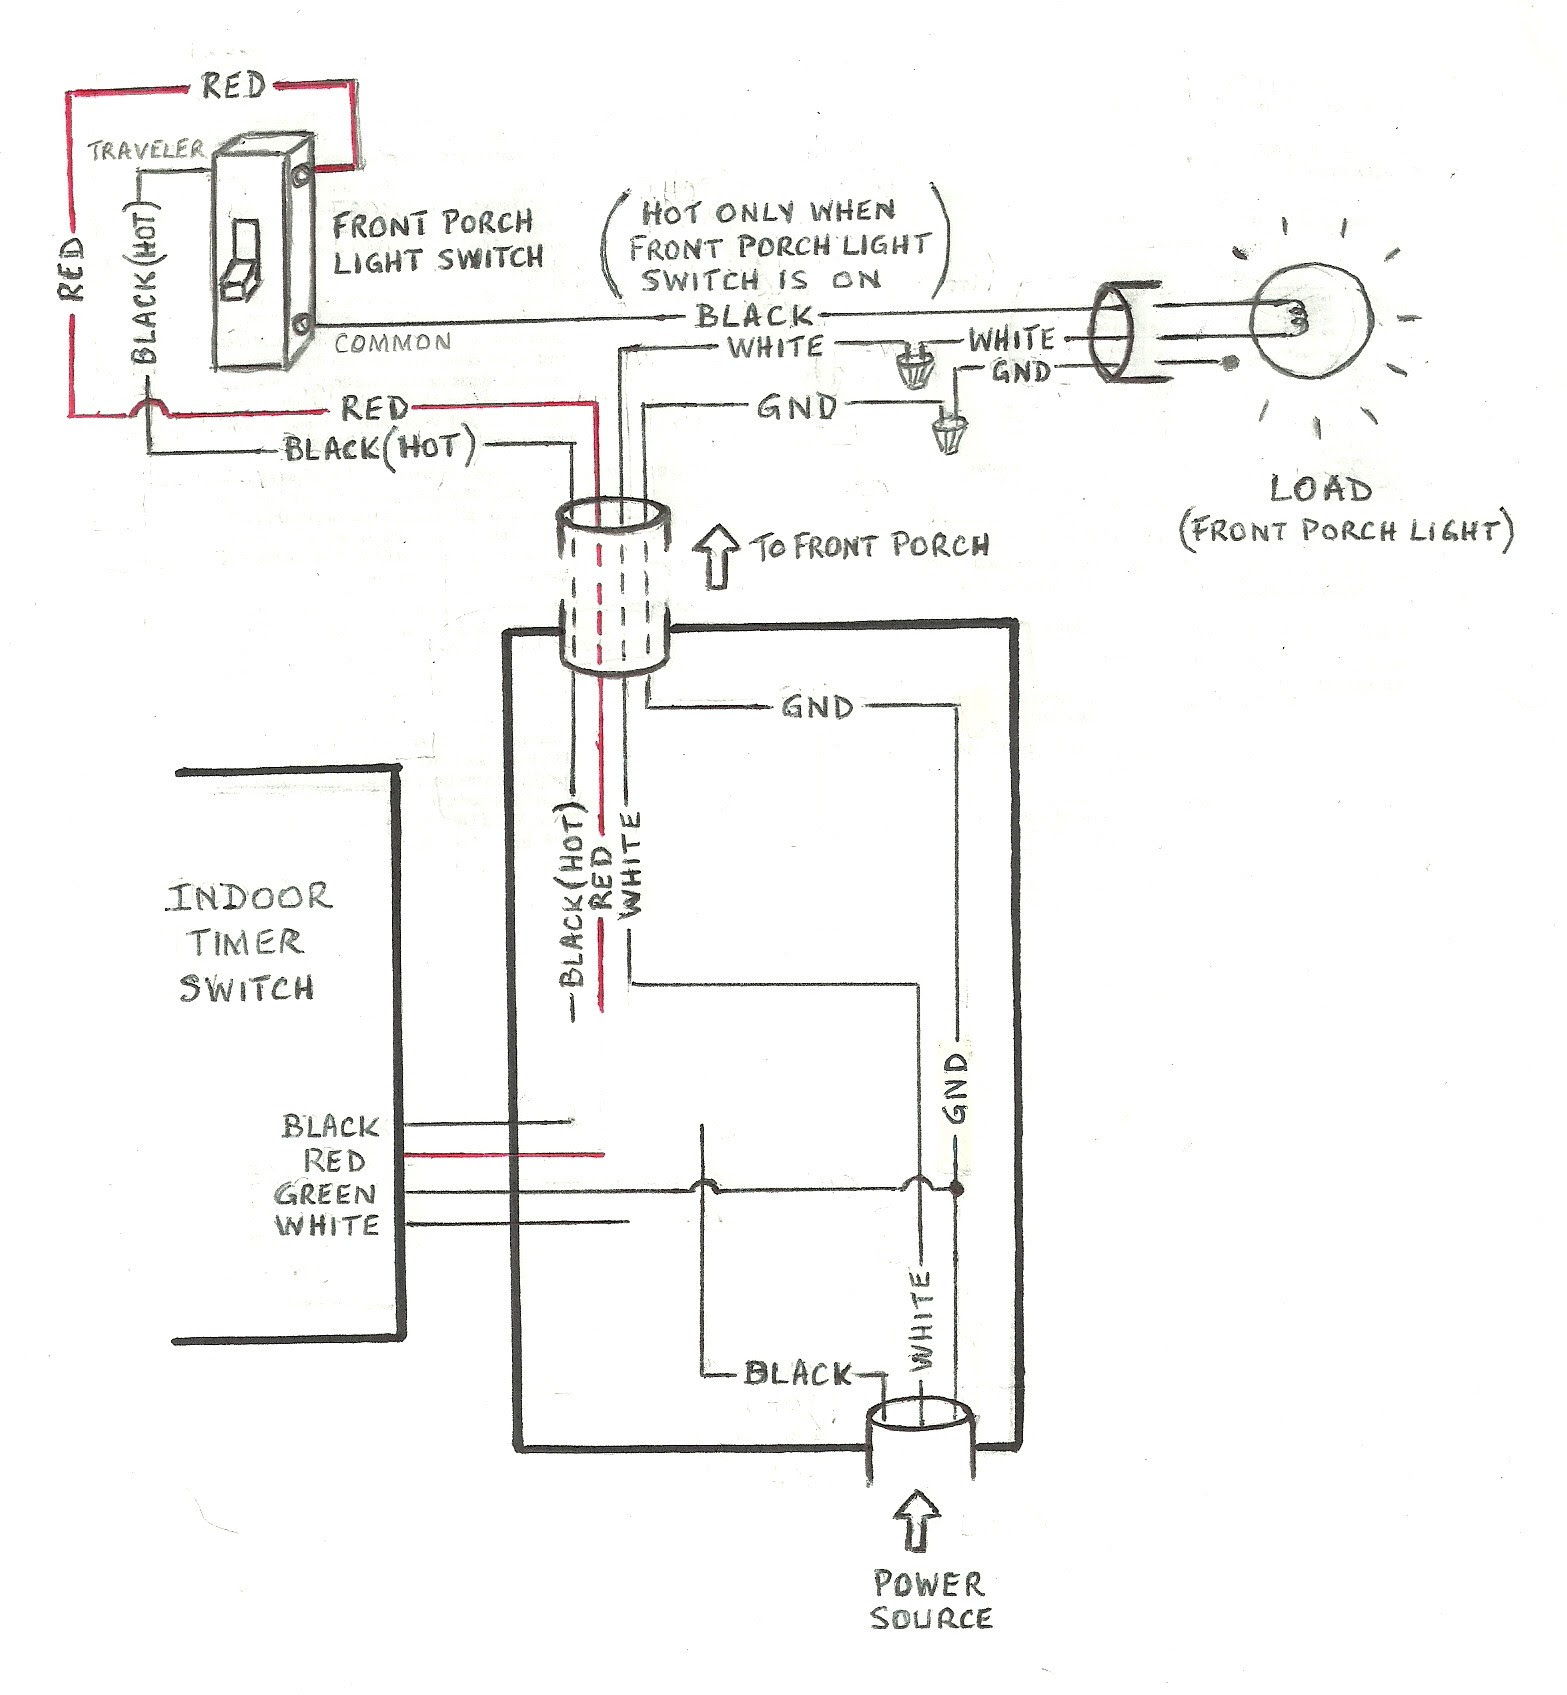 Hero Puch Wiring Diagram